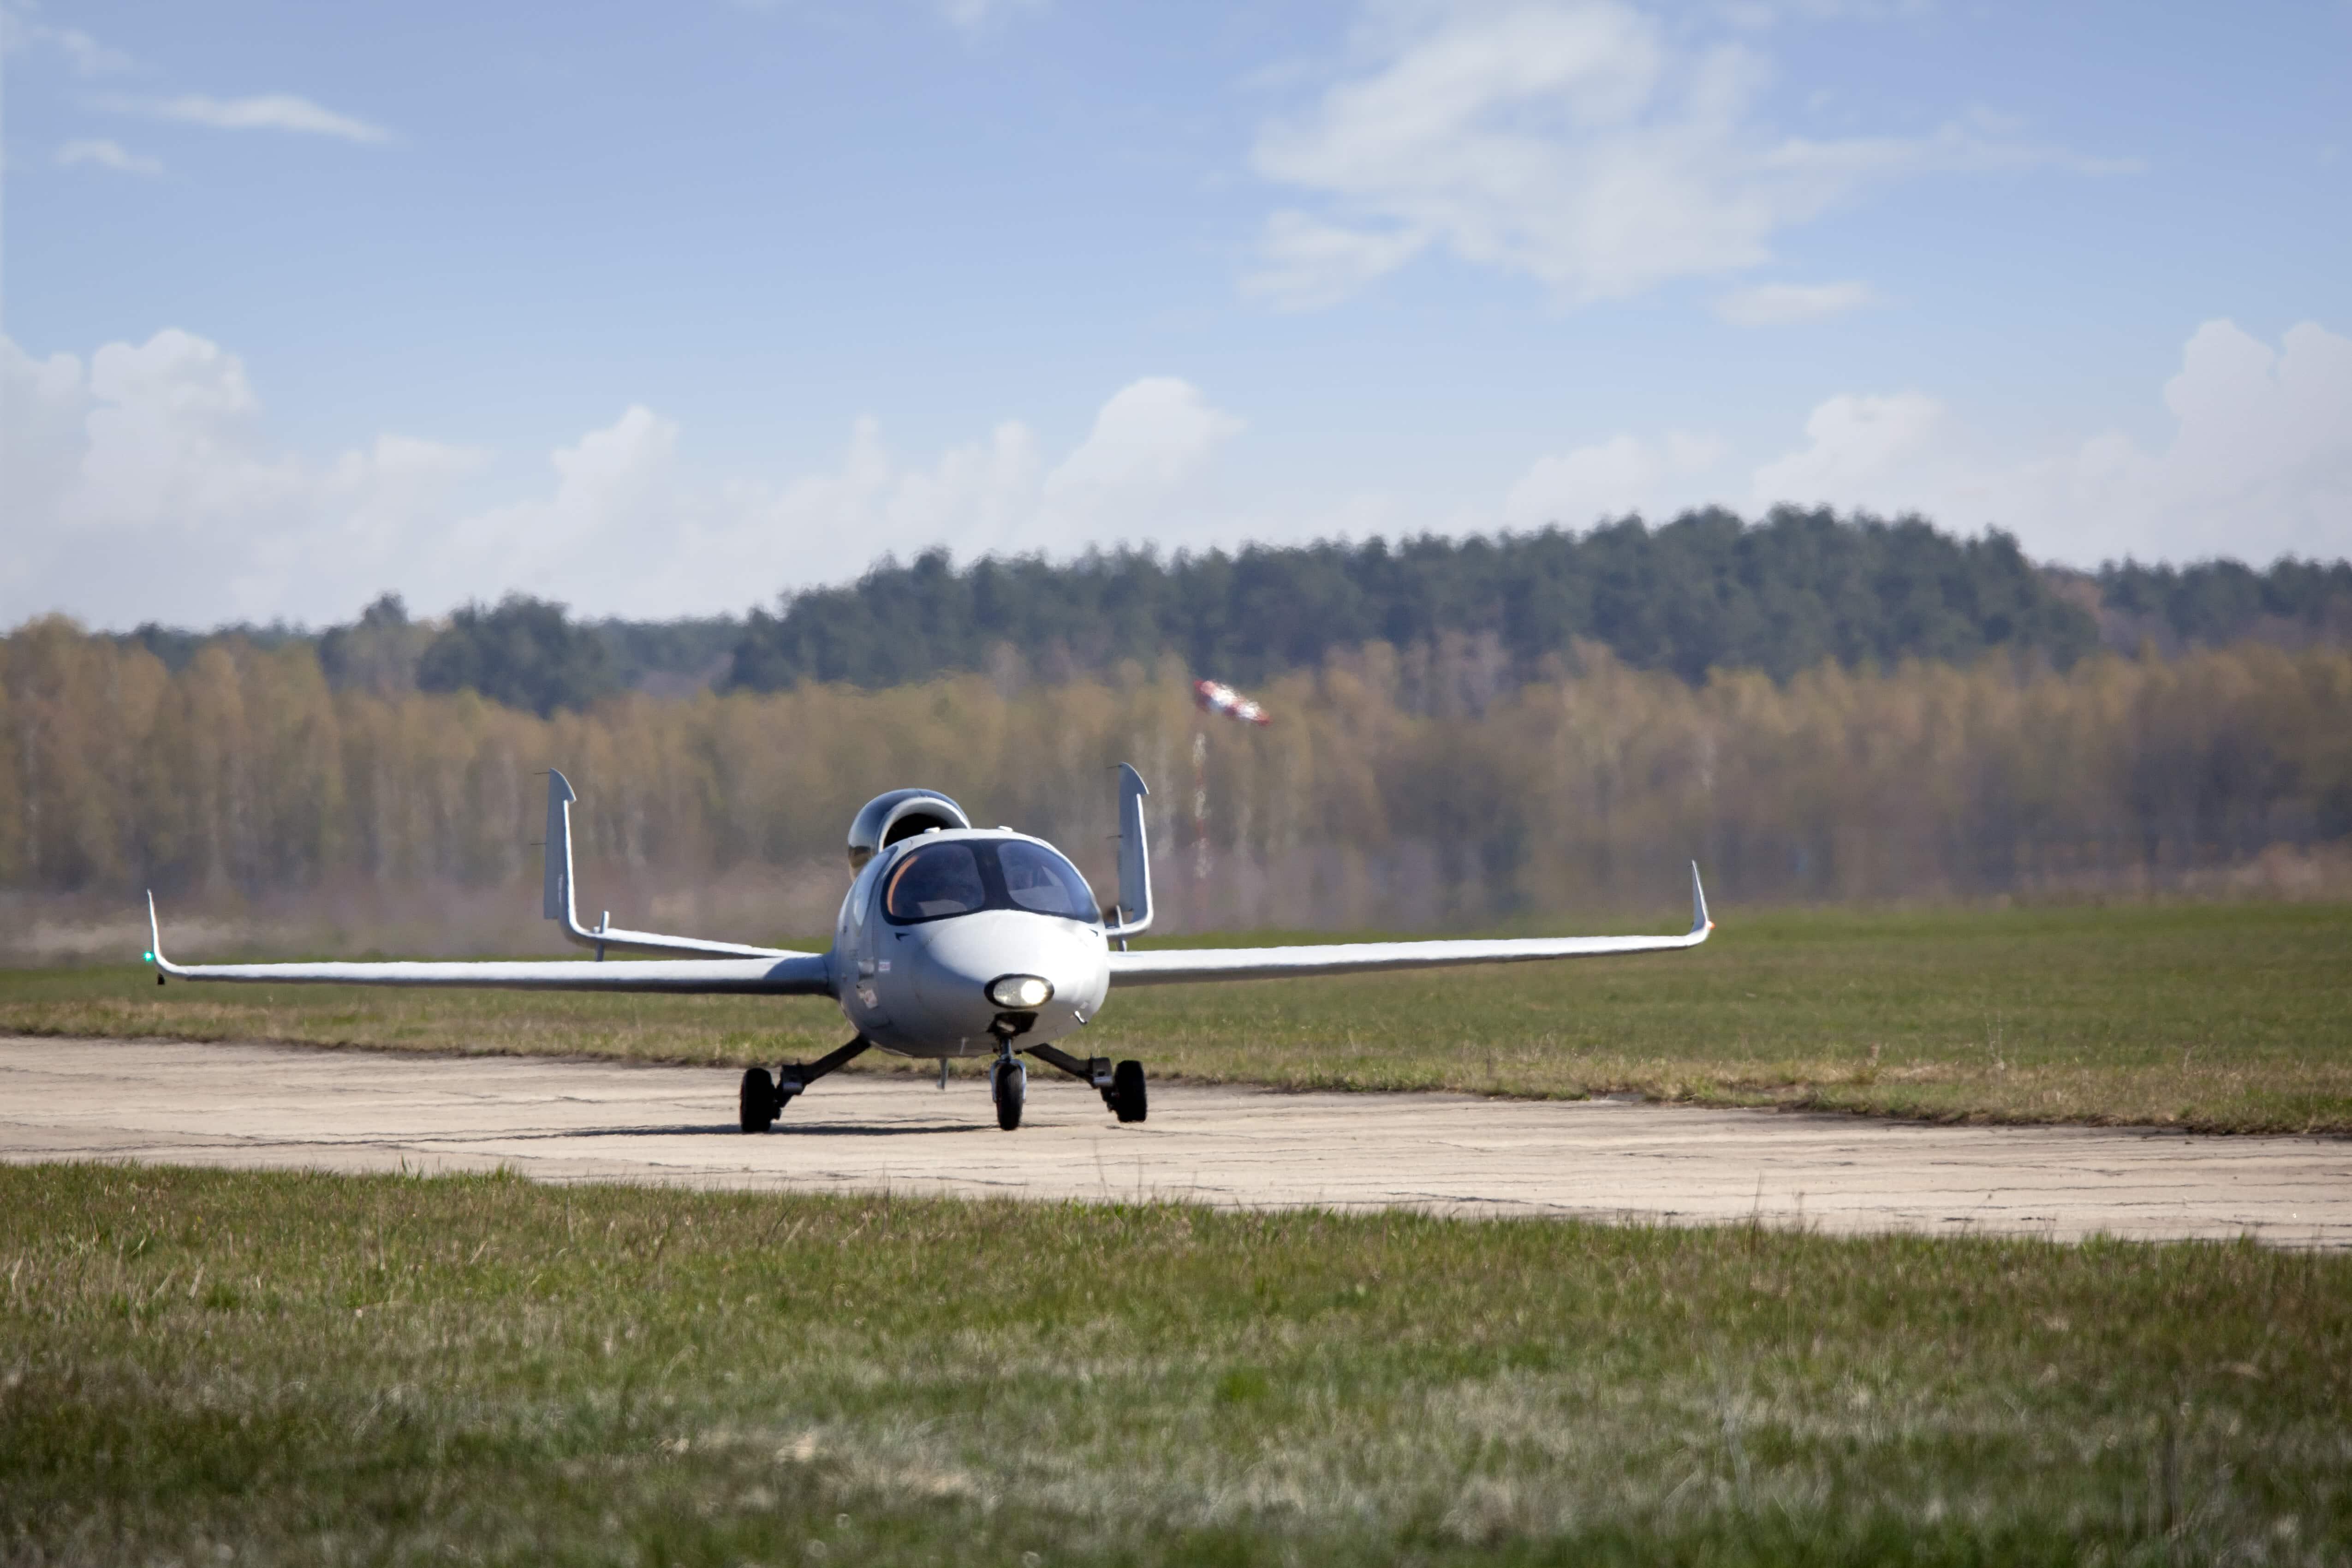 FLARIS LAR1 first flight